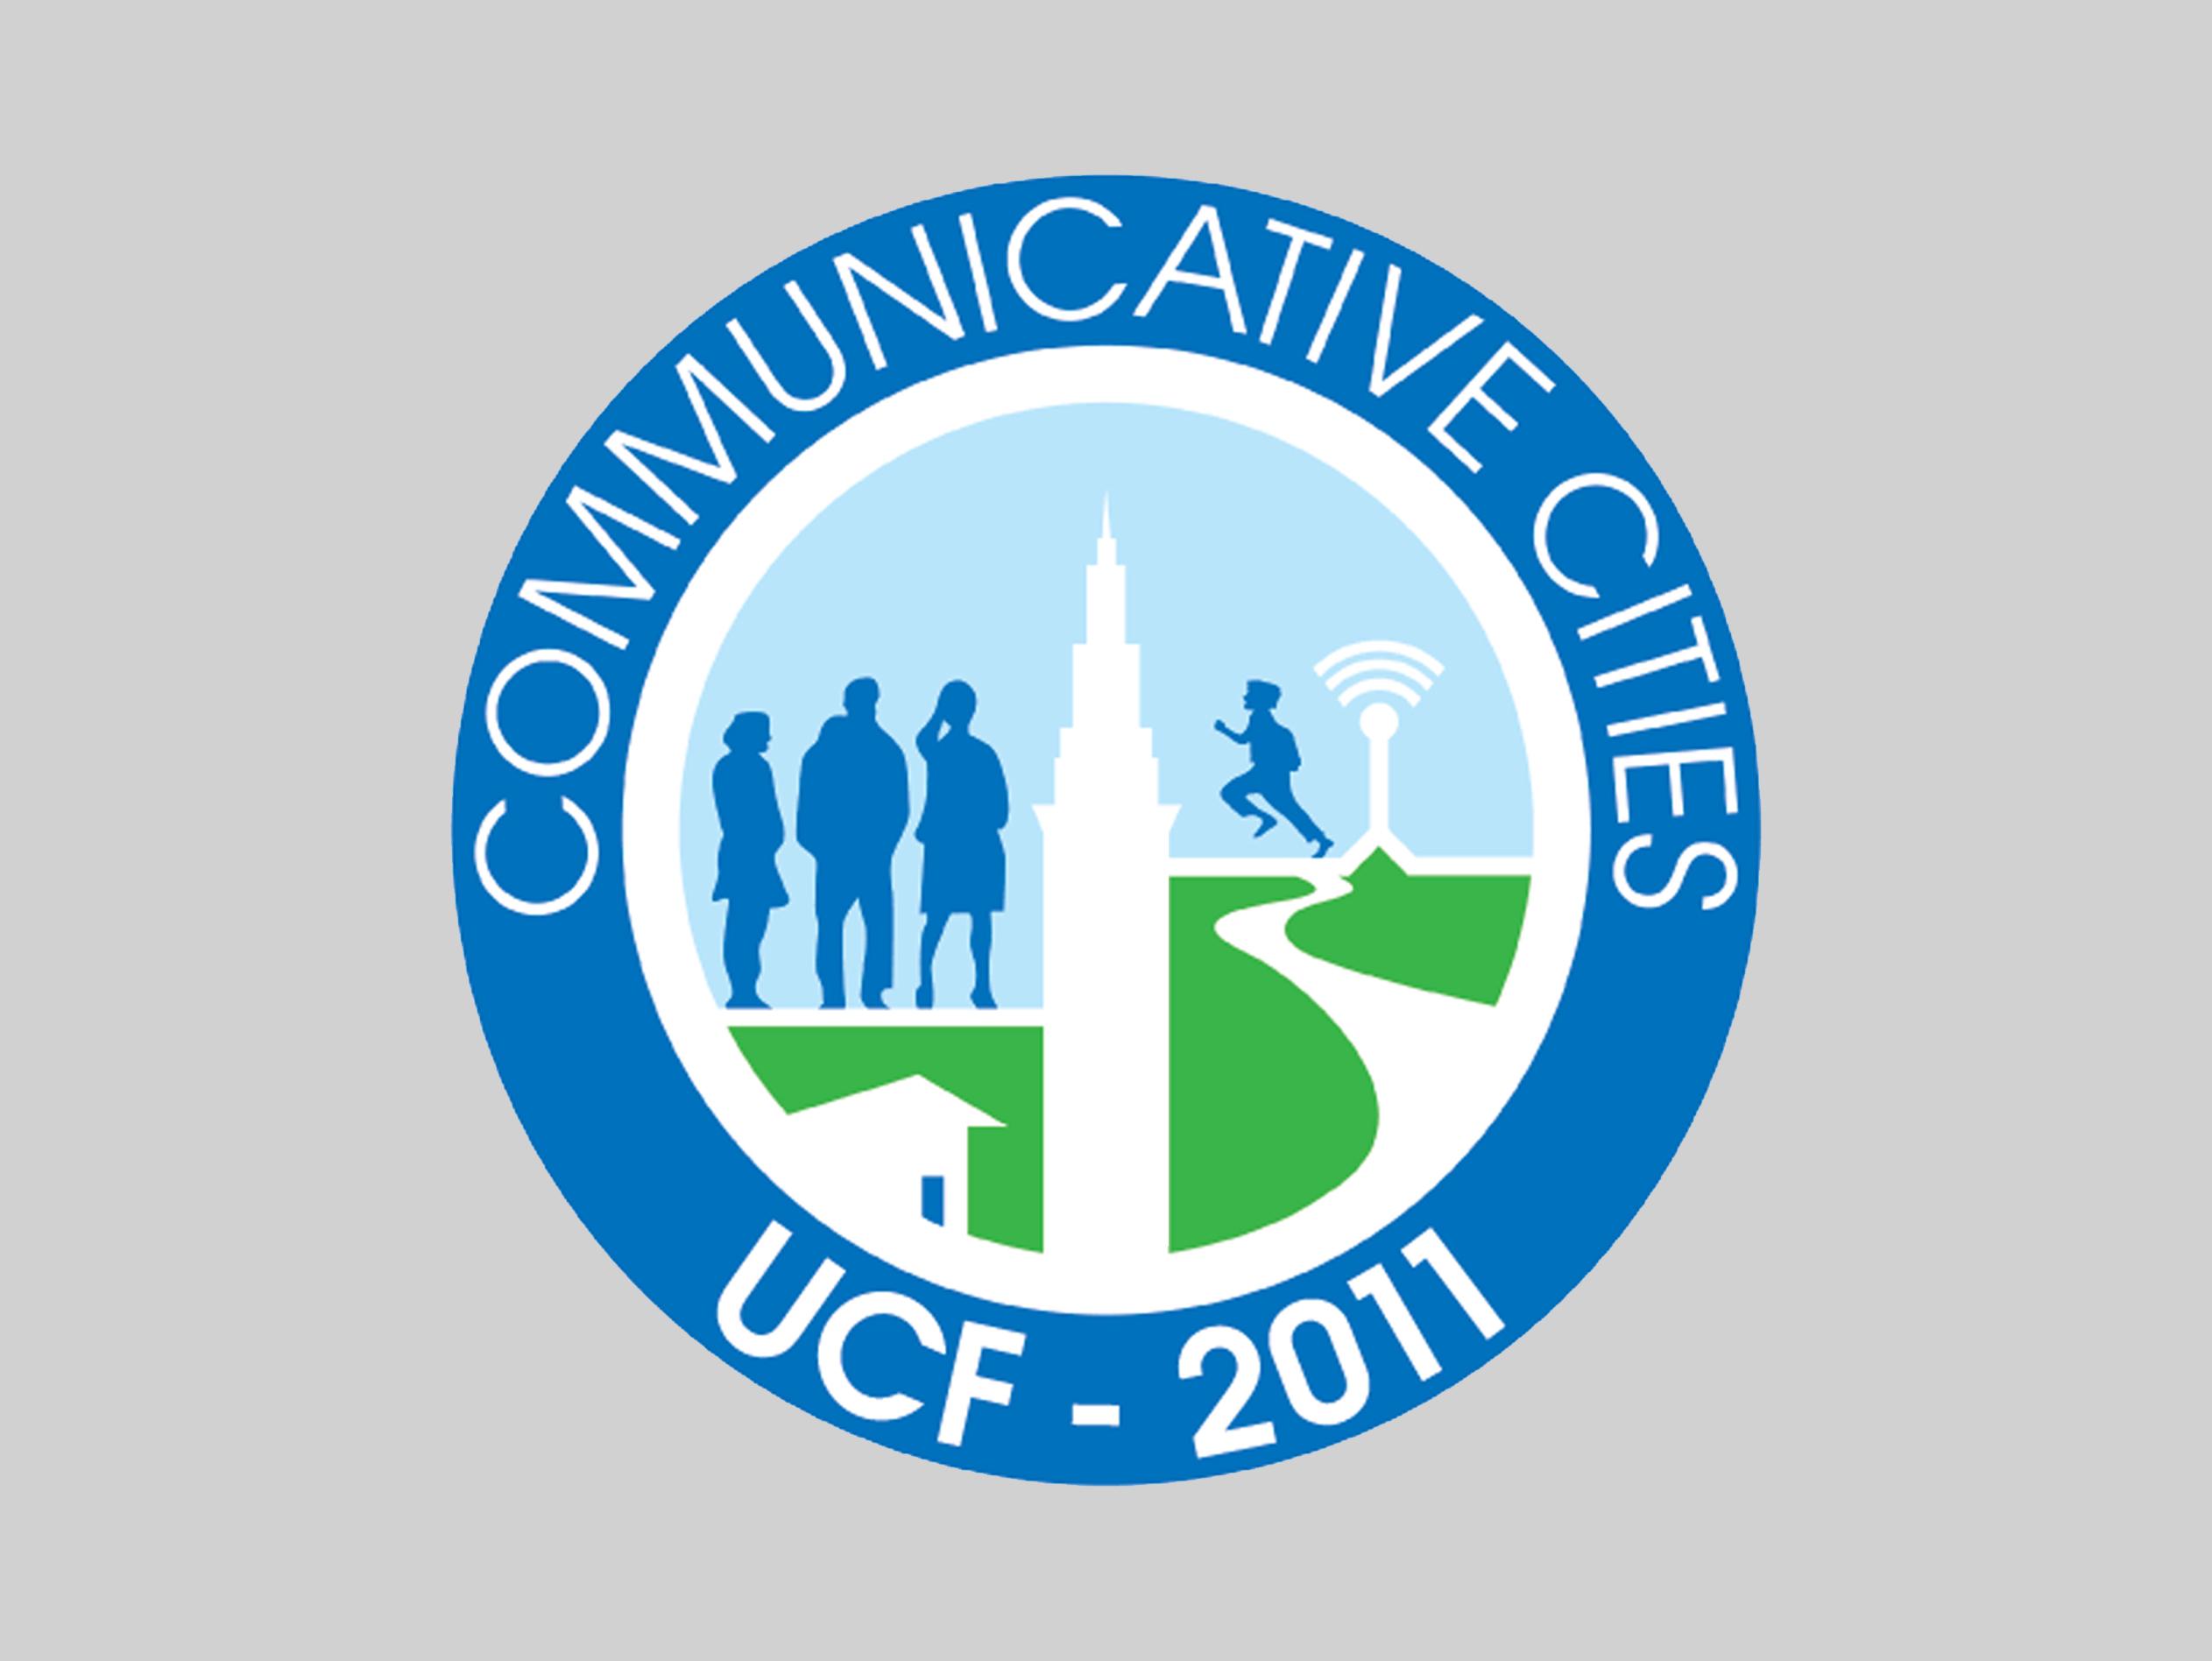 Communicative Cities Award Logo